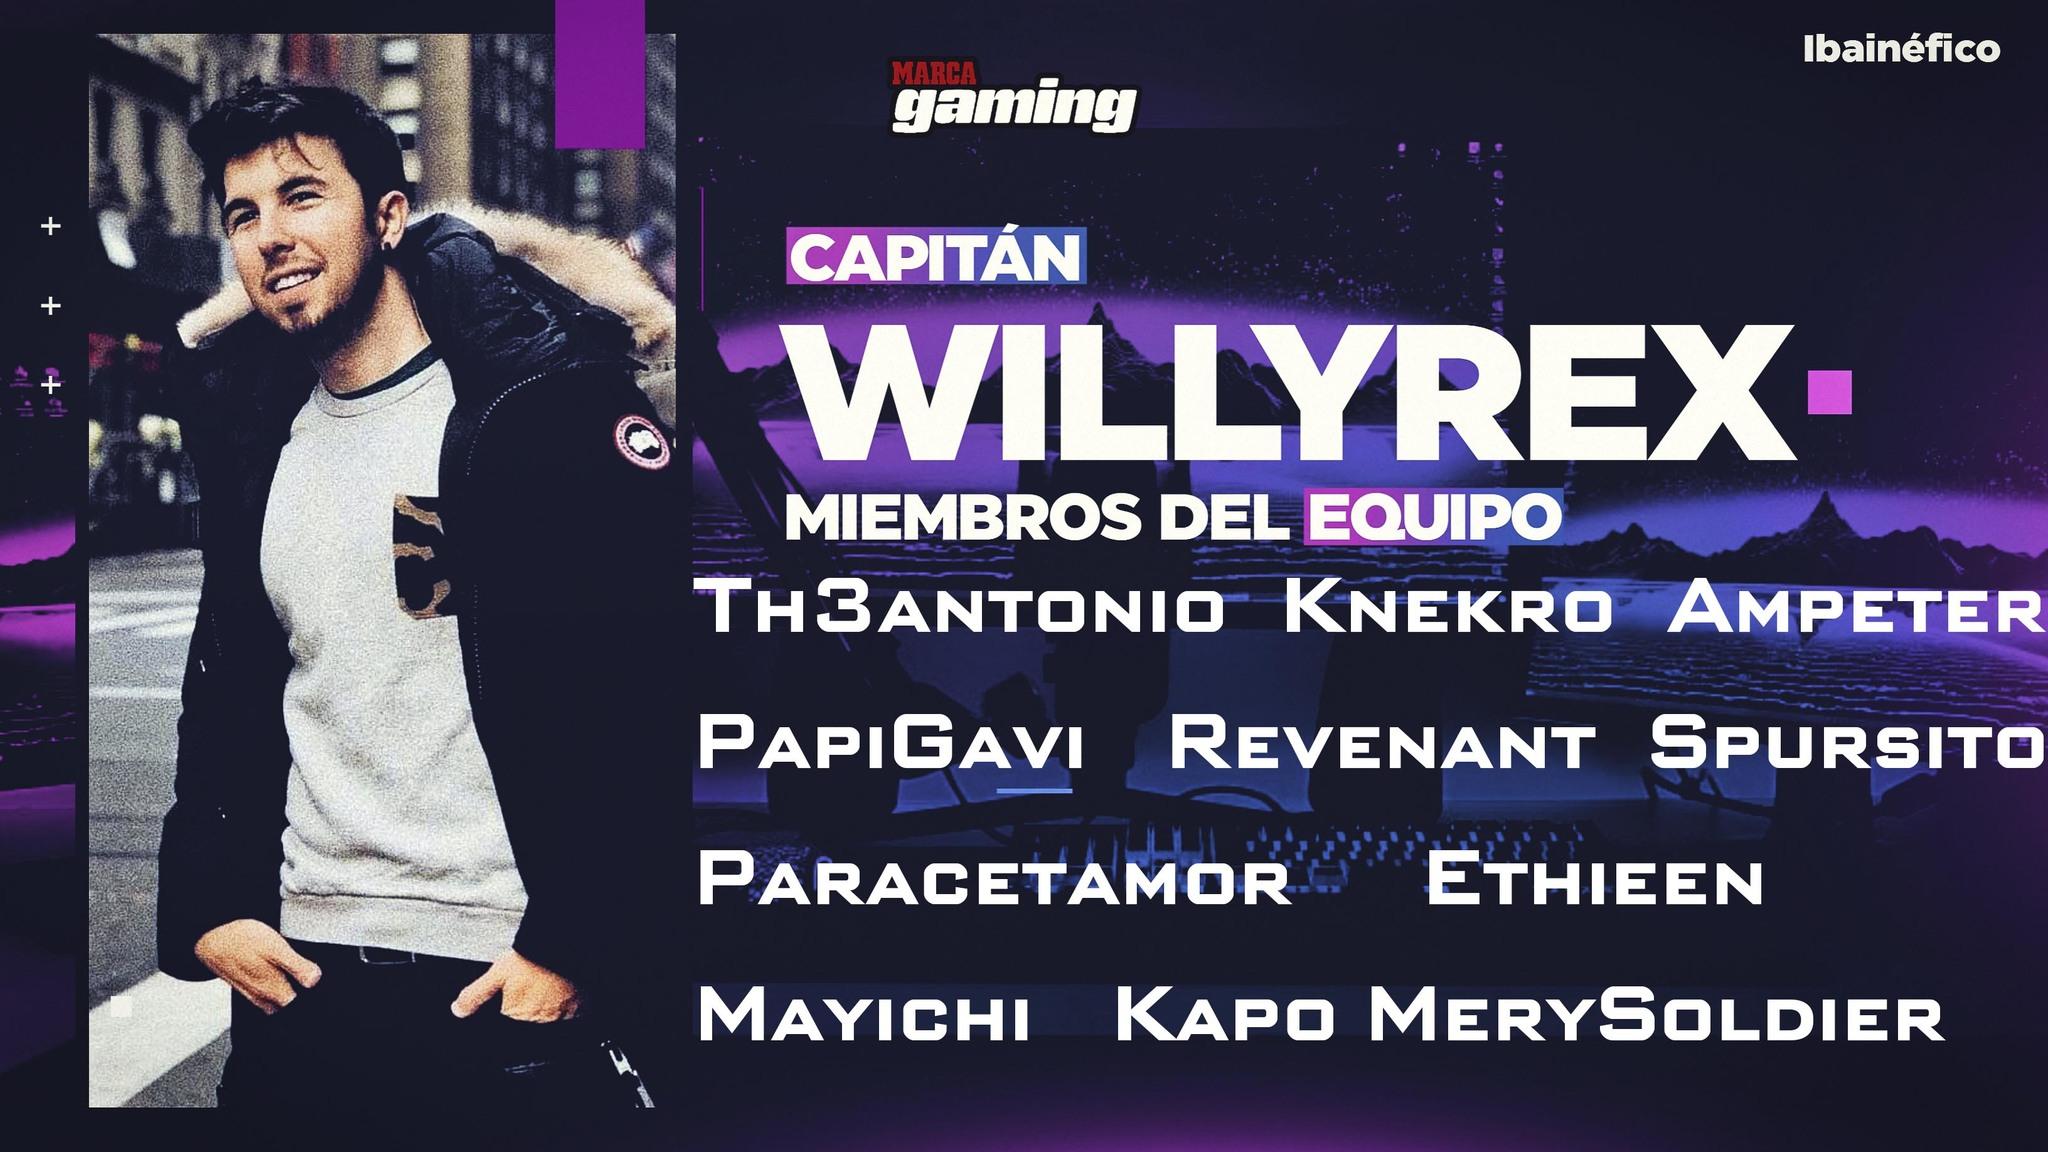 Equipo de Willyrex Ibainéfico 2020